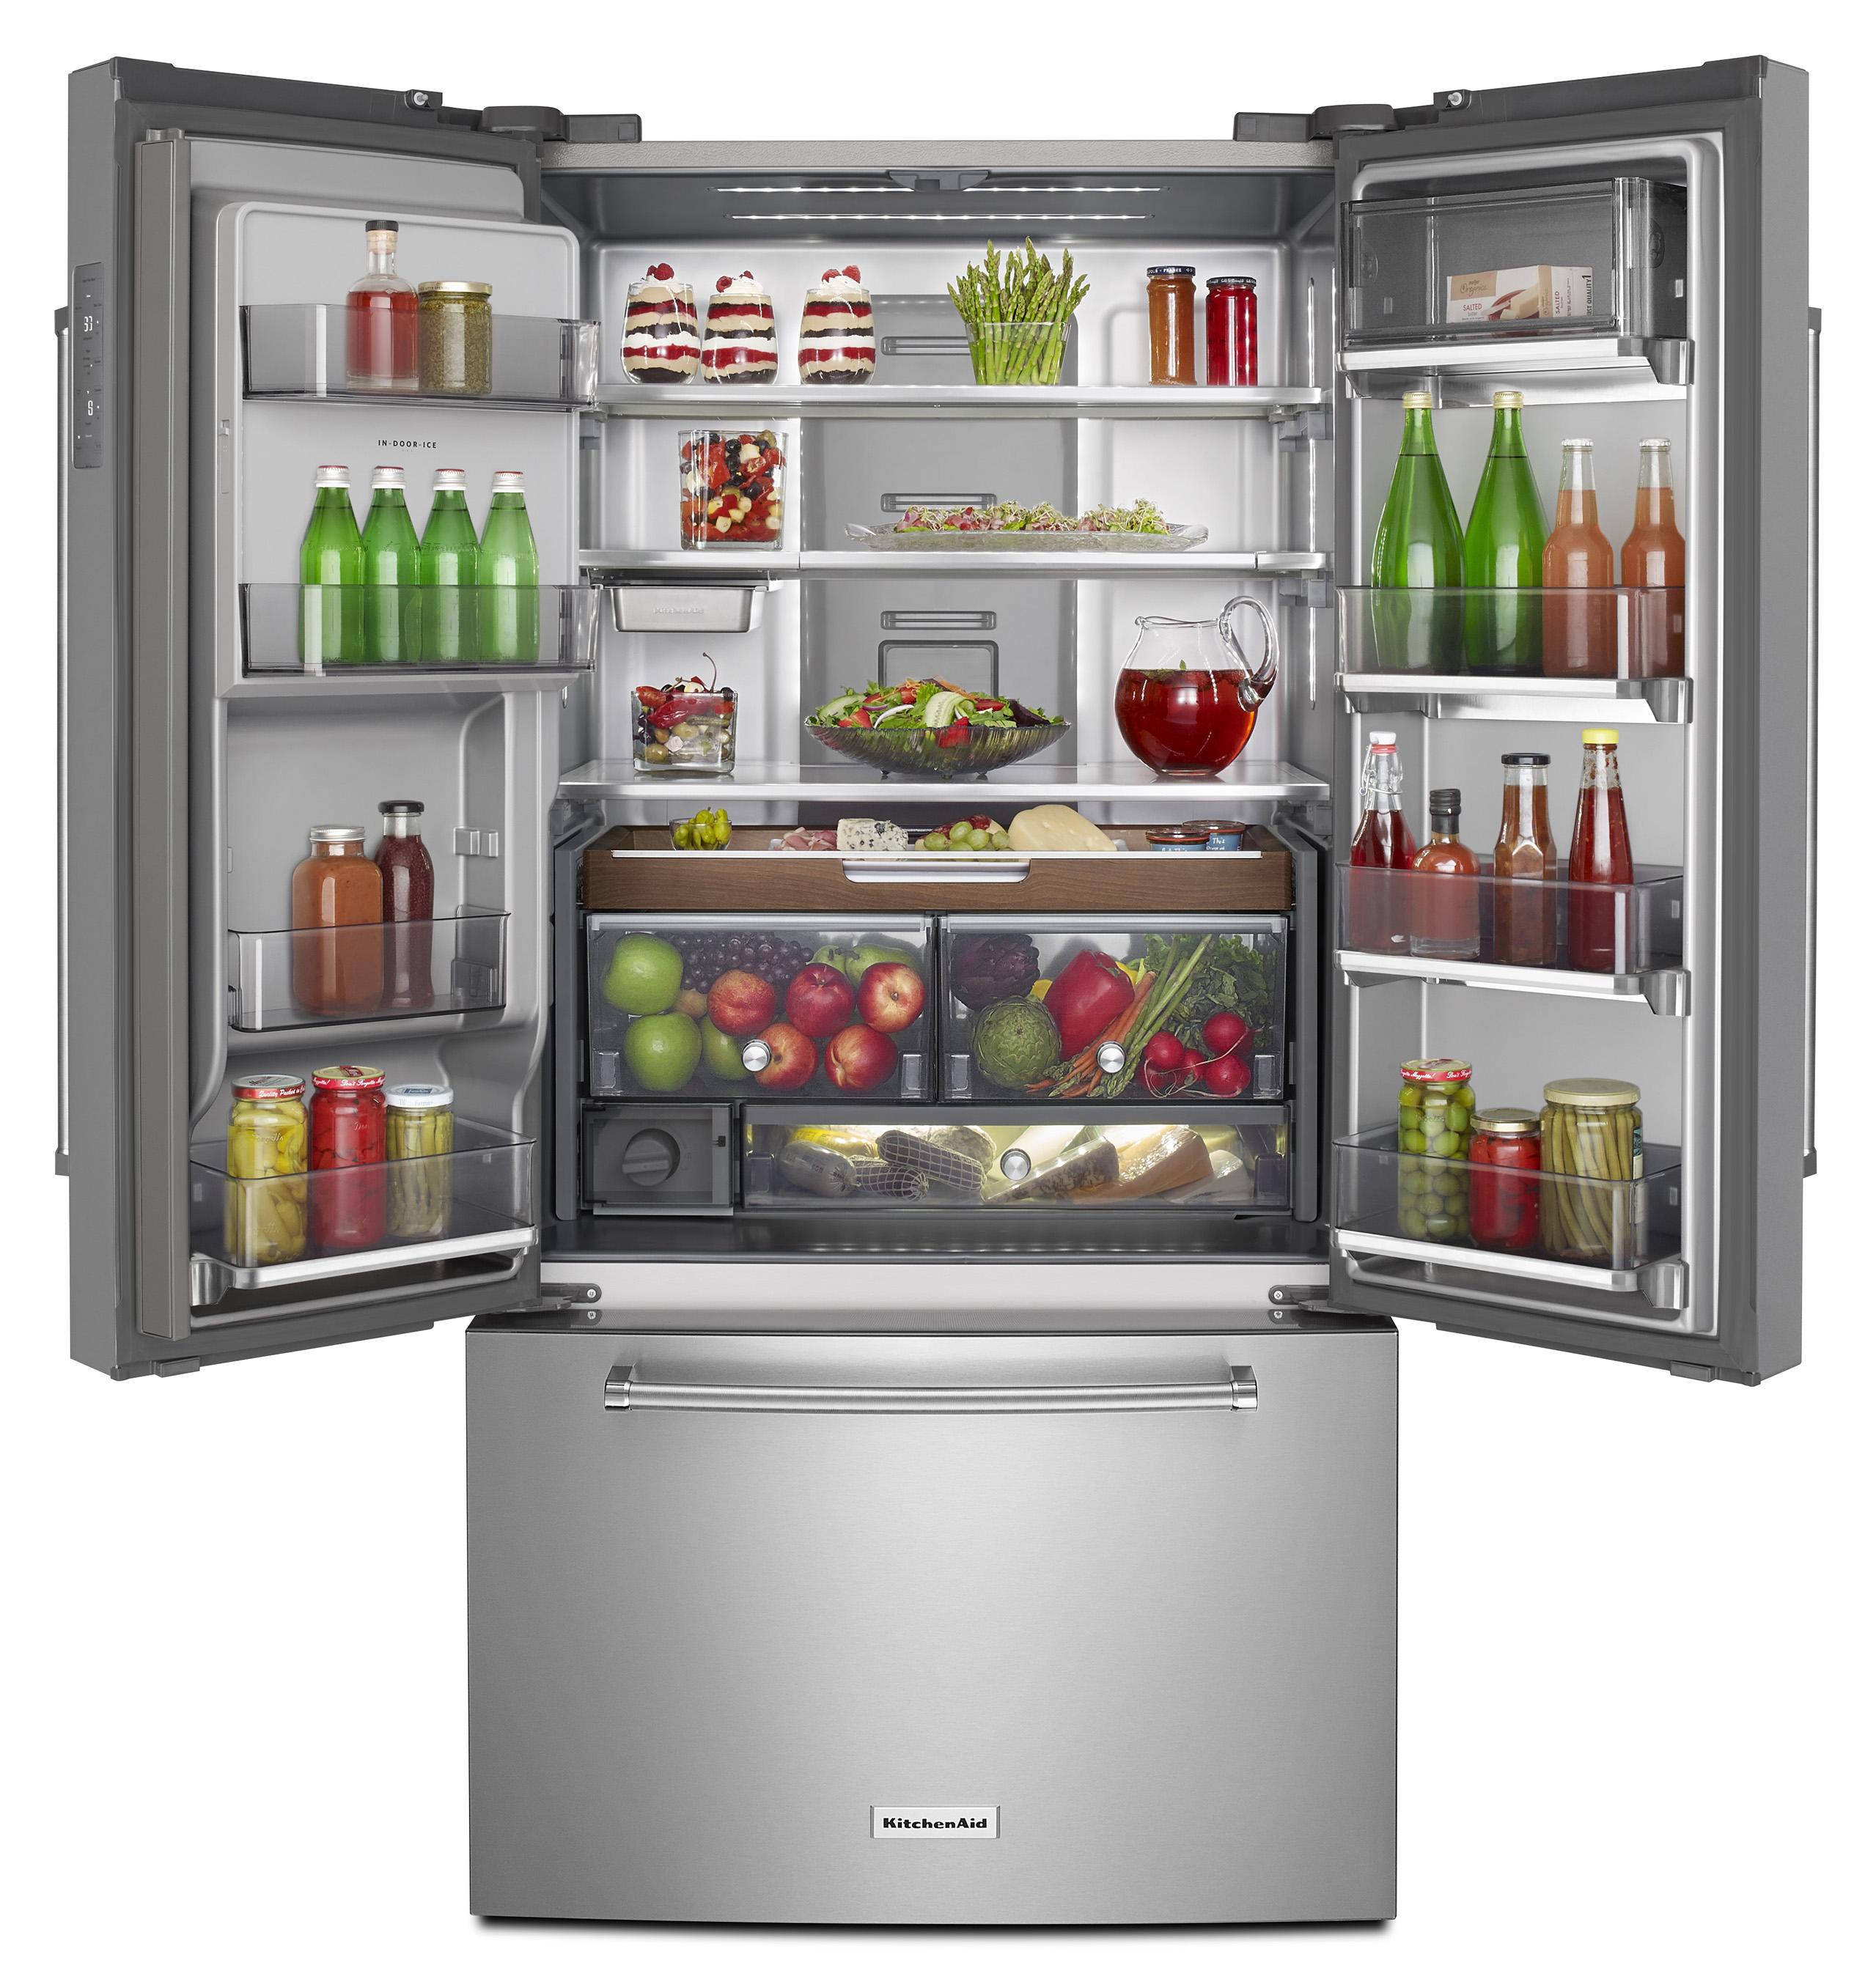 Kitchenaid Introduces Three Door Free Standing Refrigerator